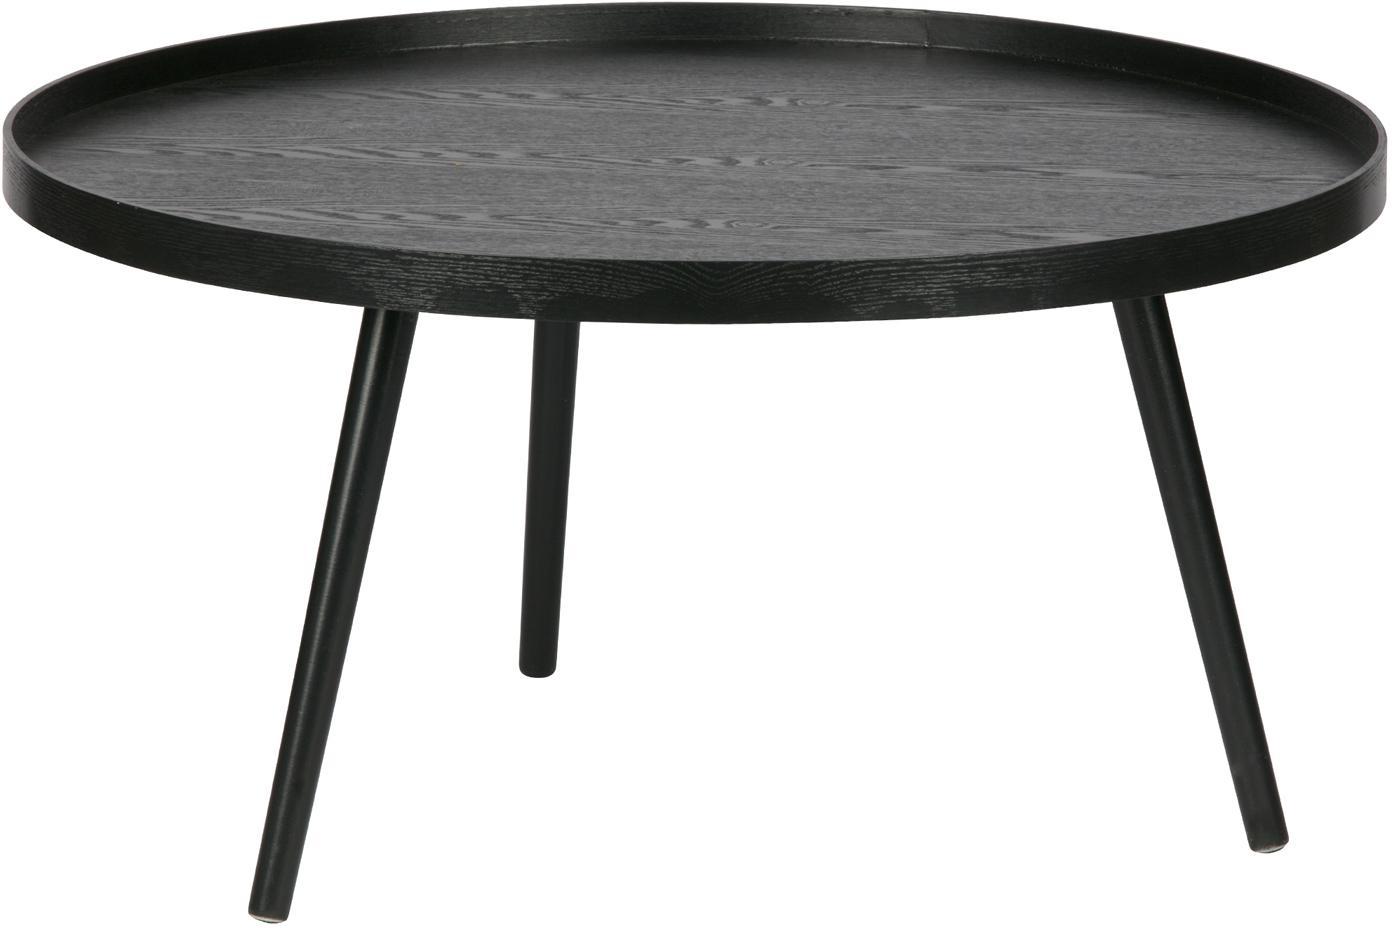 Mesa de centro redonda de madera Mesa, Tablero de fibras de densidad media (MDF) chapada en madera de pino pintado, Negro, Ø 78 cm